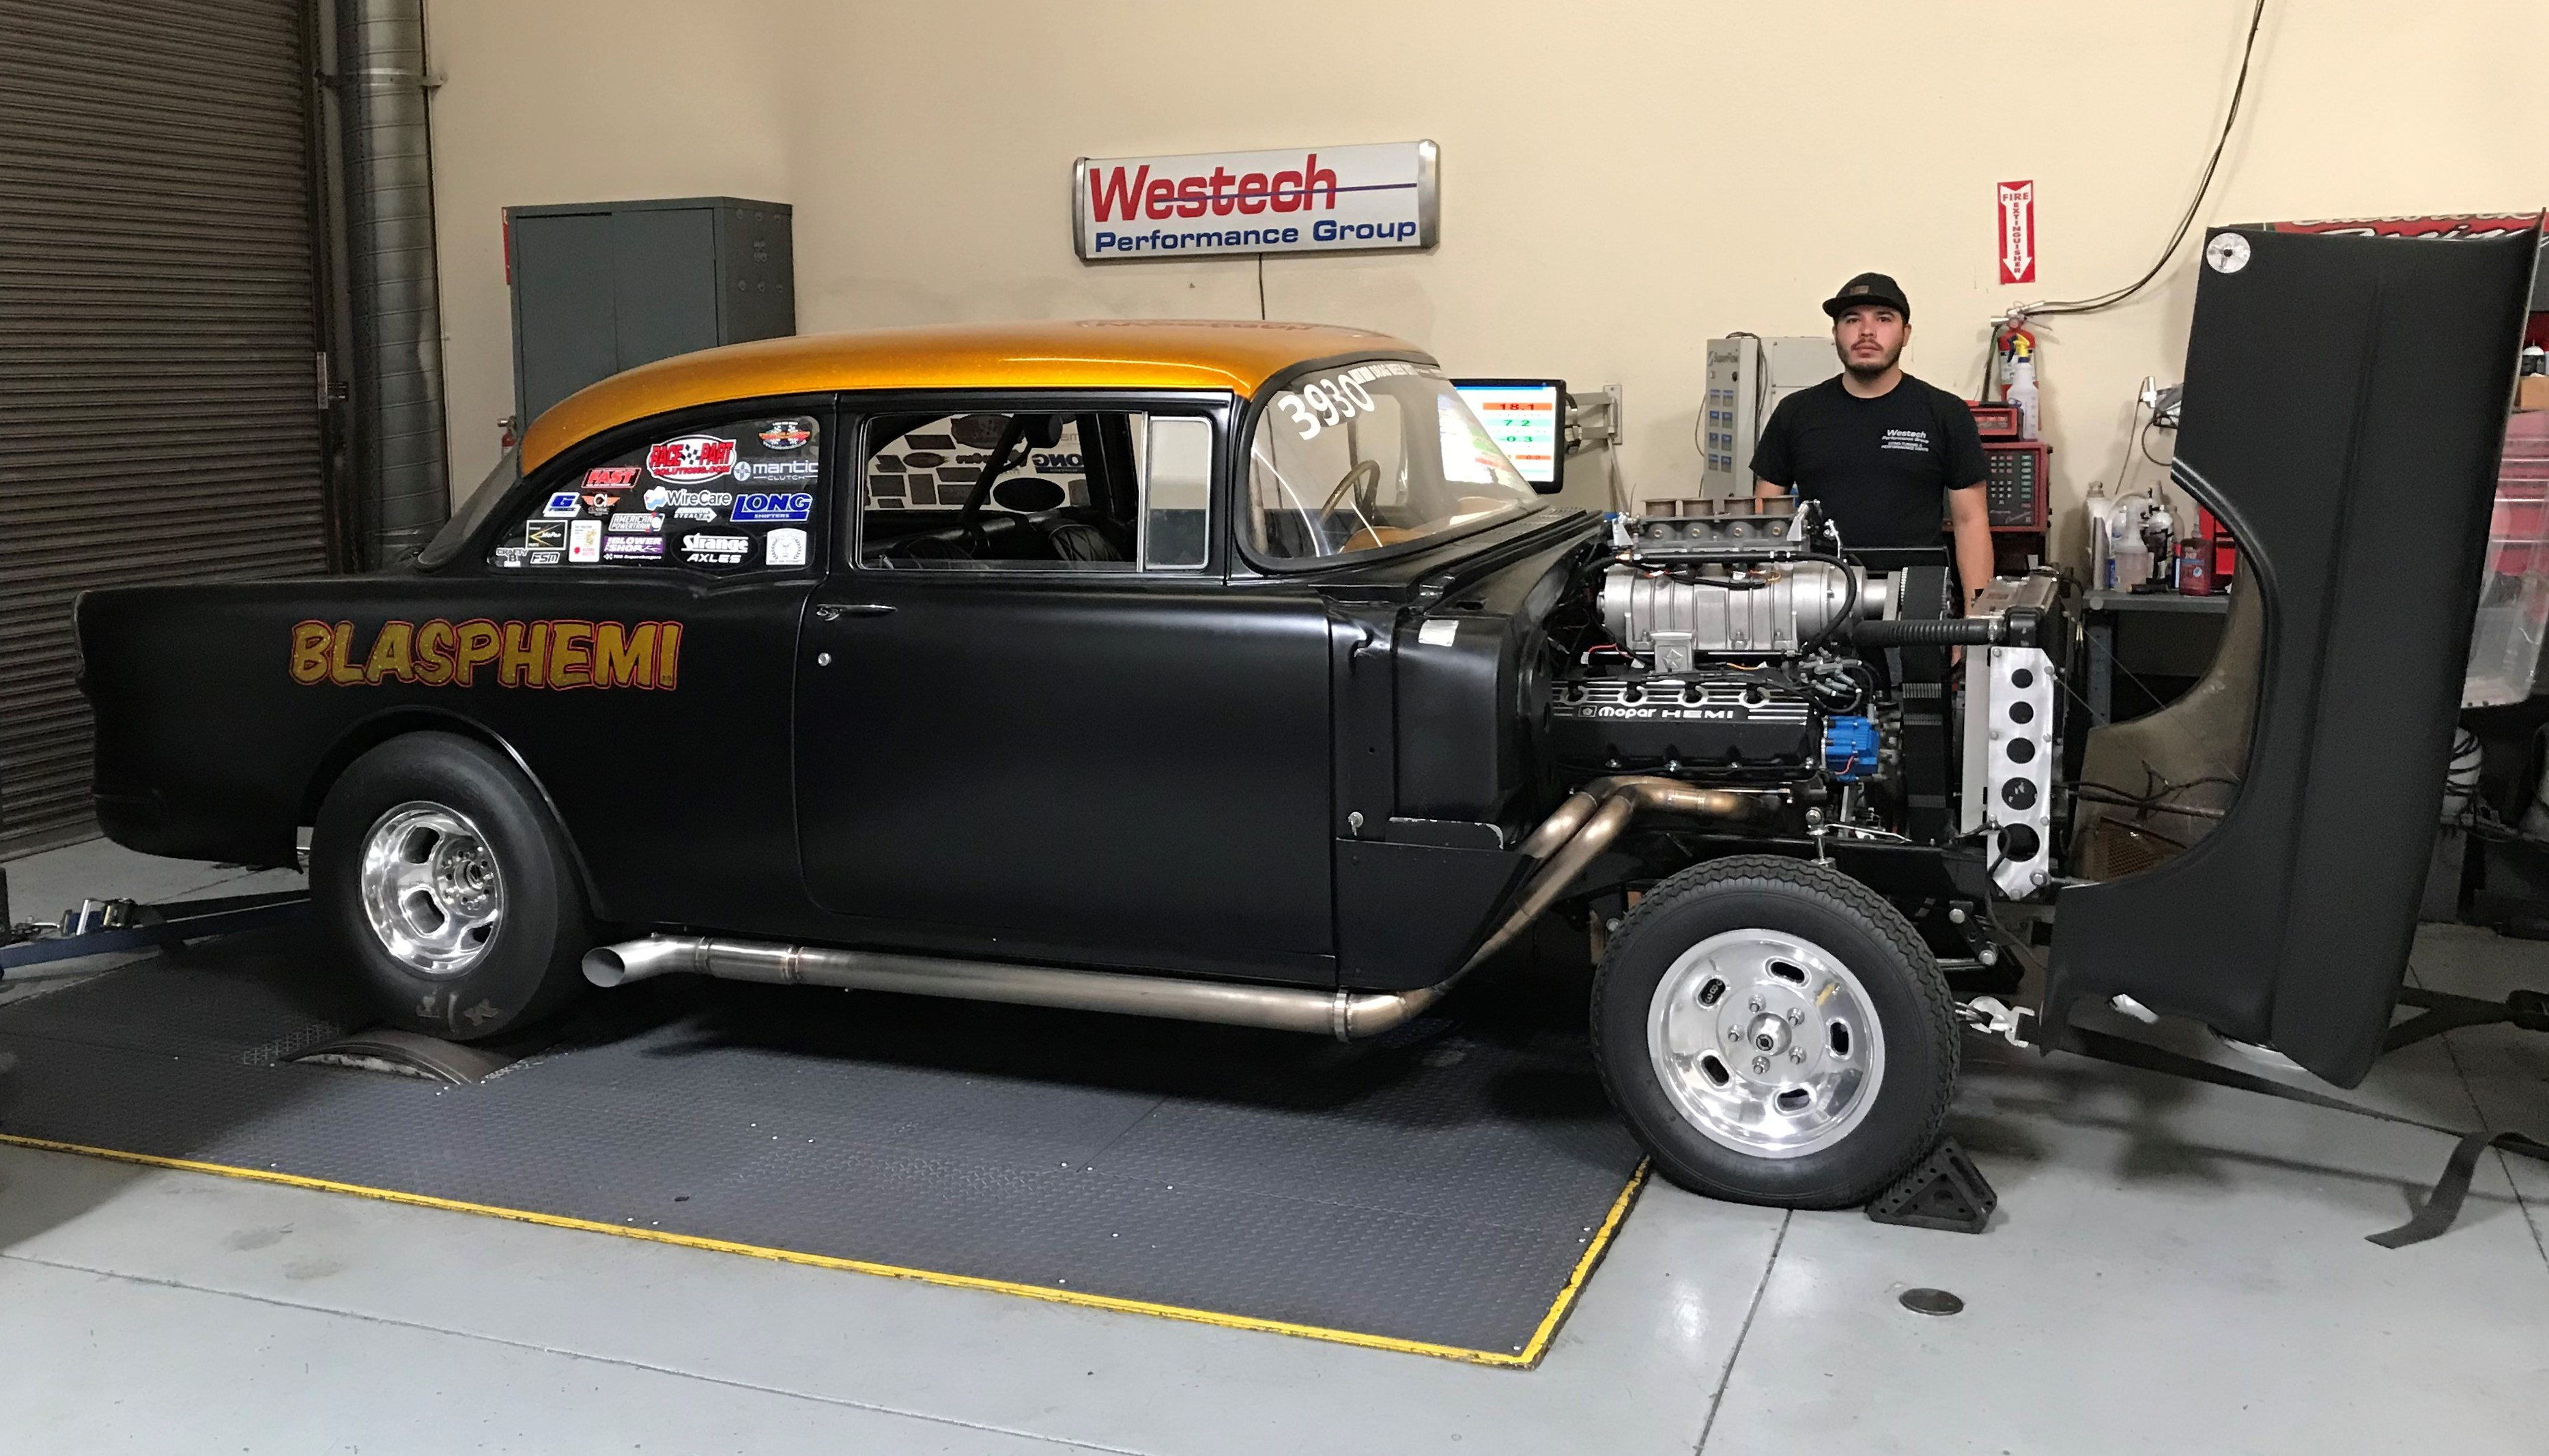 1955 Chevy Fuel Tank Wiring Diagram Database Chevrolet Holley Efi Powers Mike Finnegan S Incredible Blasphemi 55 Schematics